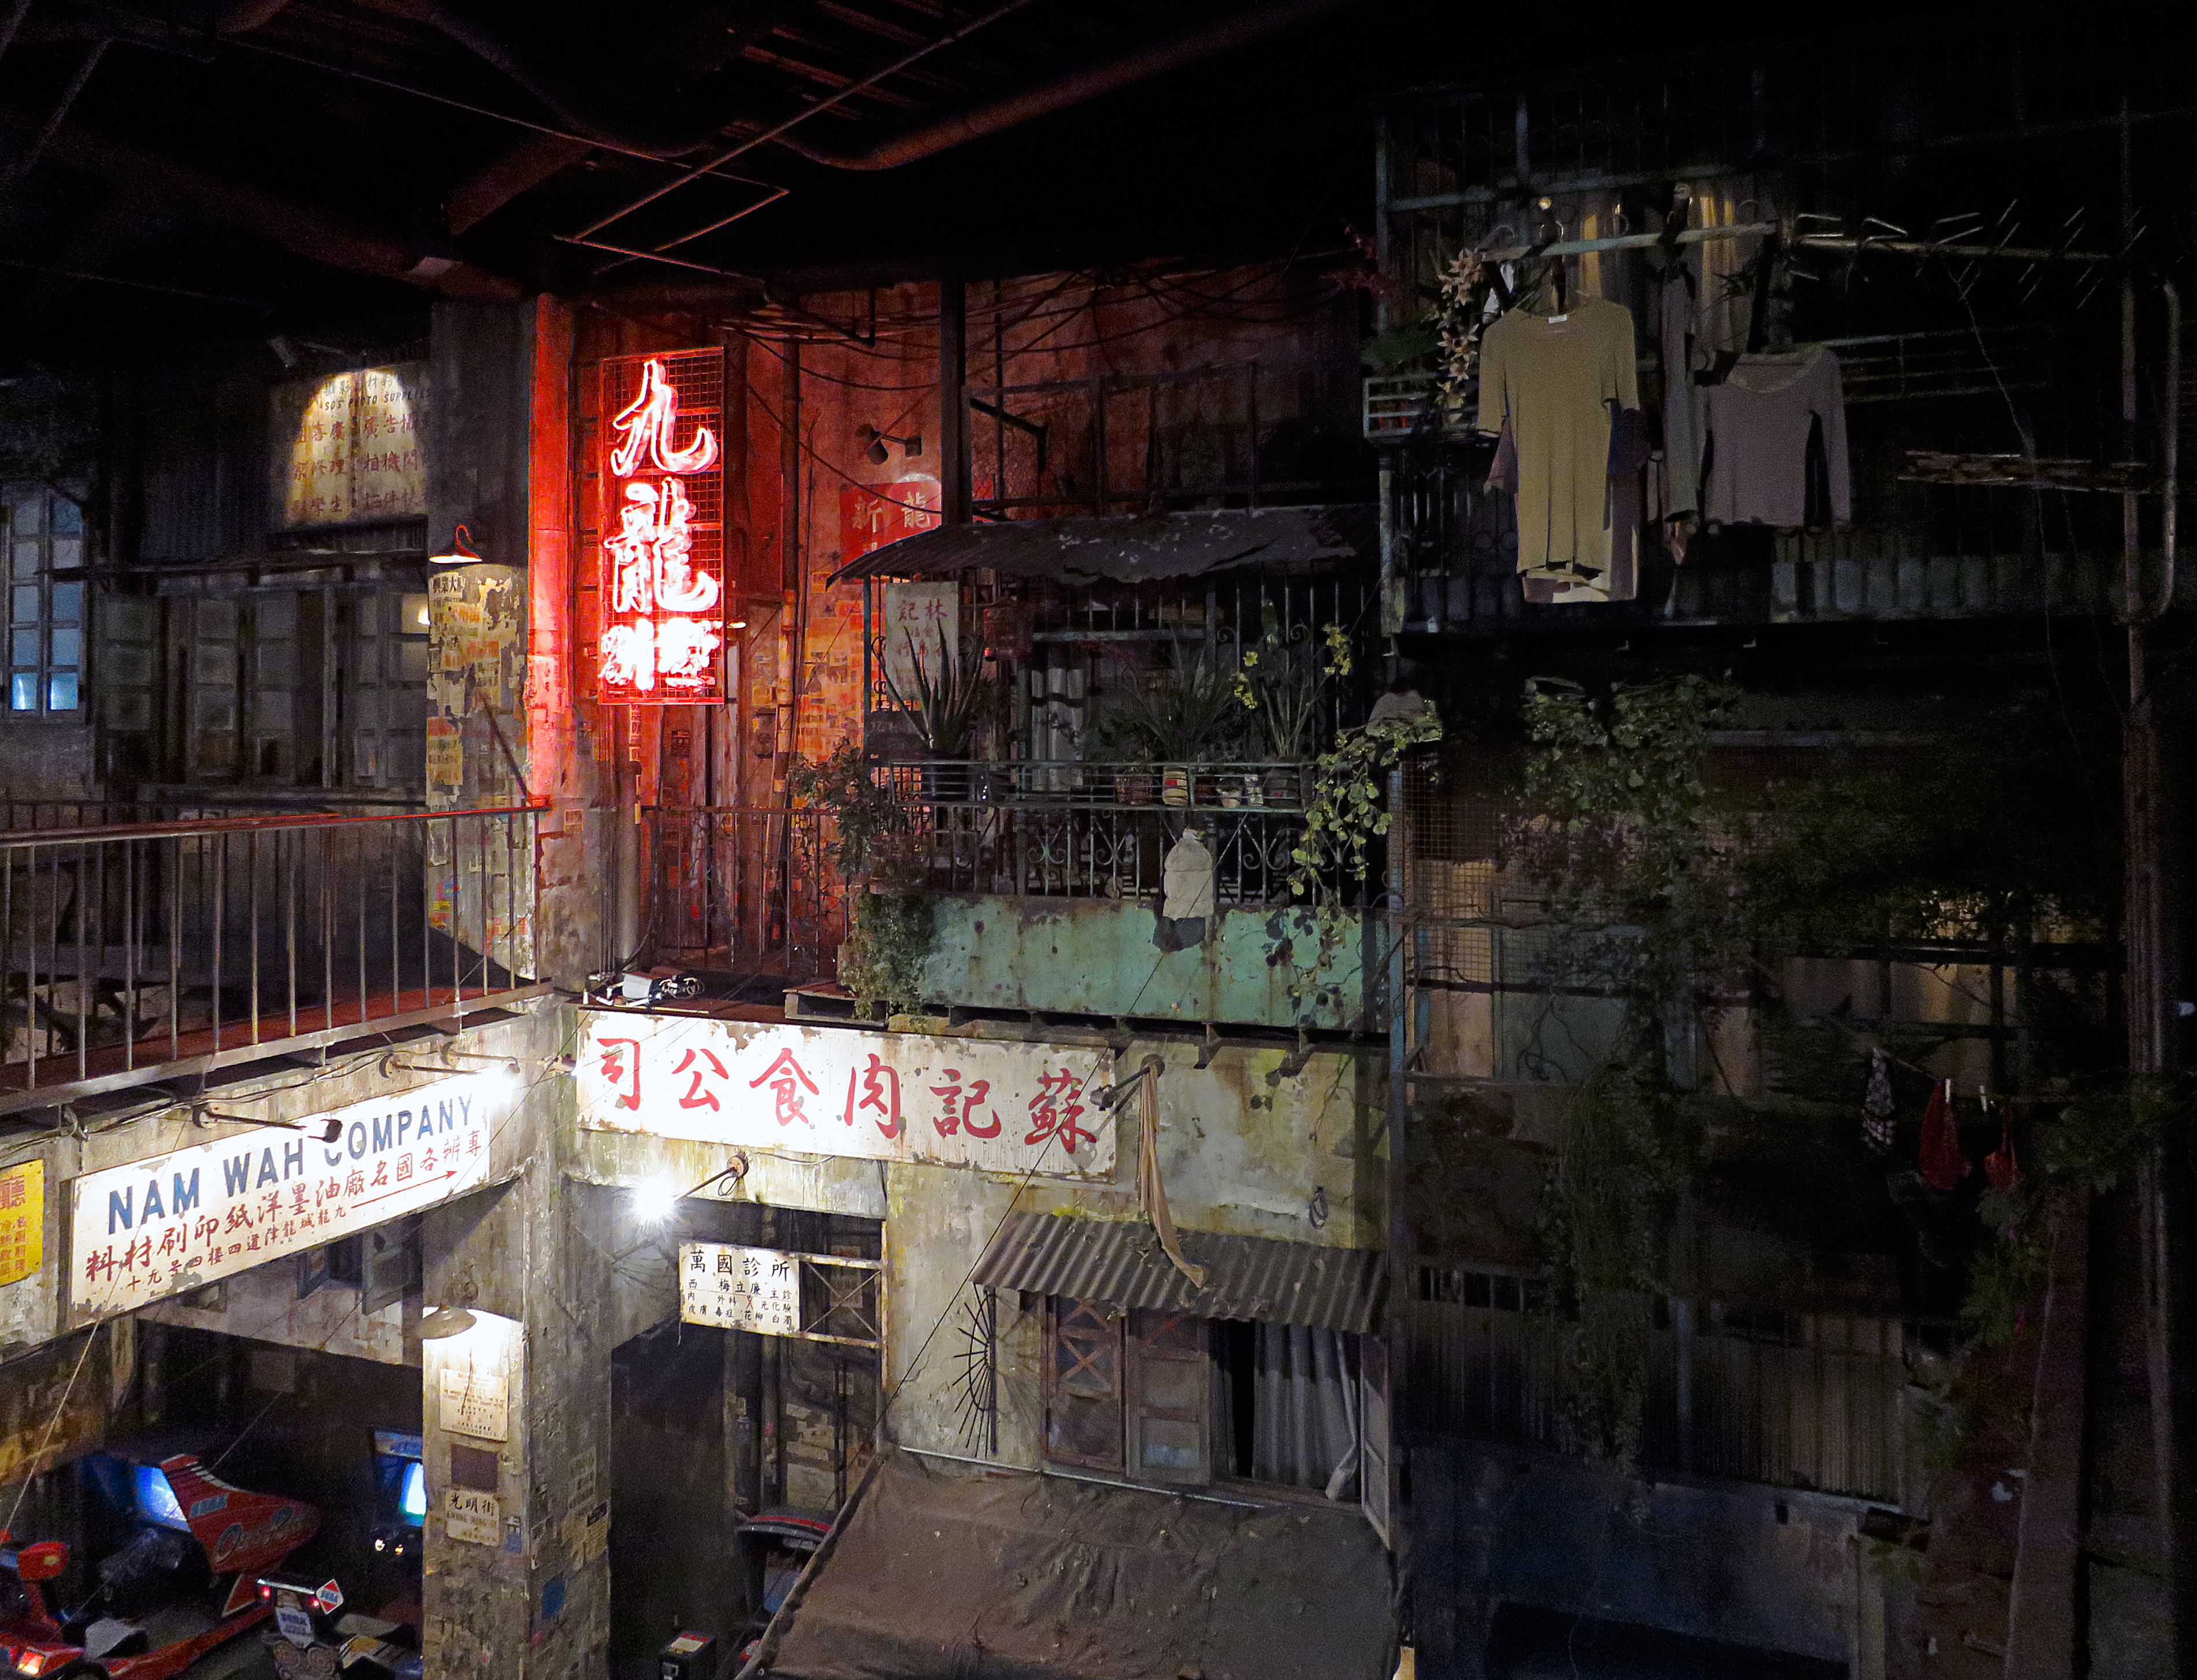 File:Cyber Kowloon Walled City - 25 - Warehouse Kawasaki, 2014-06-02